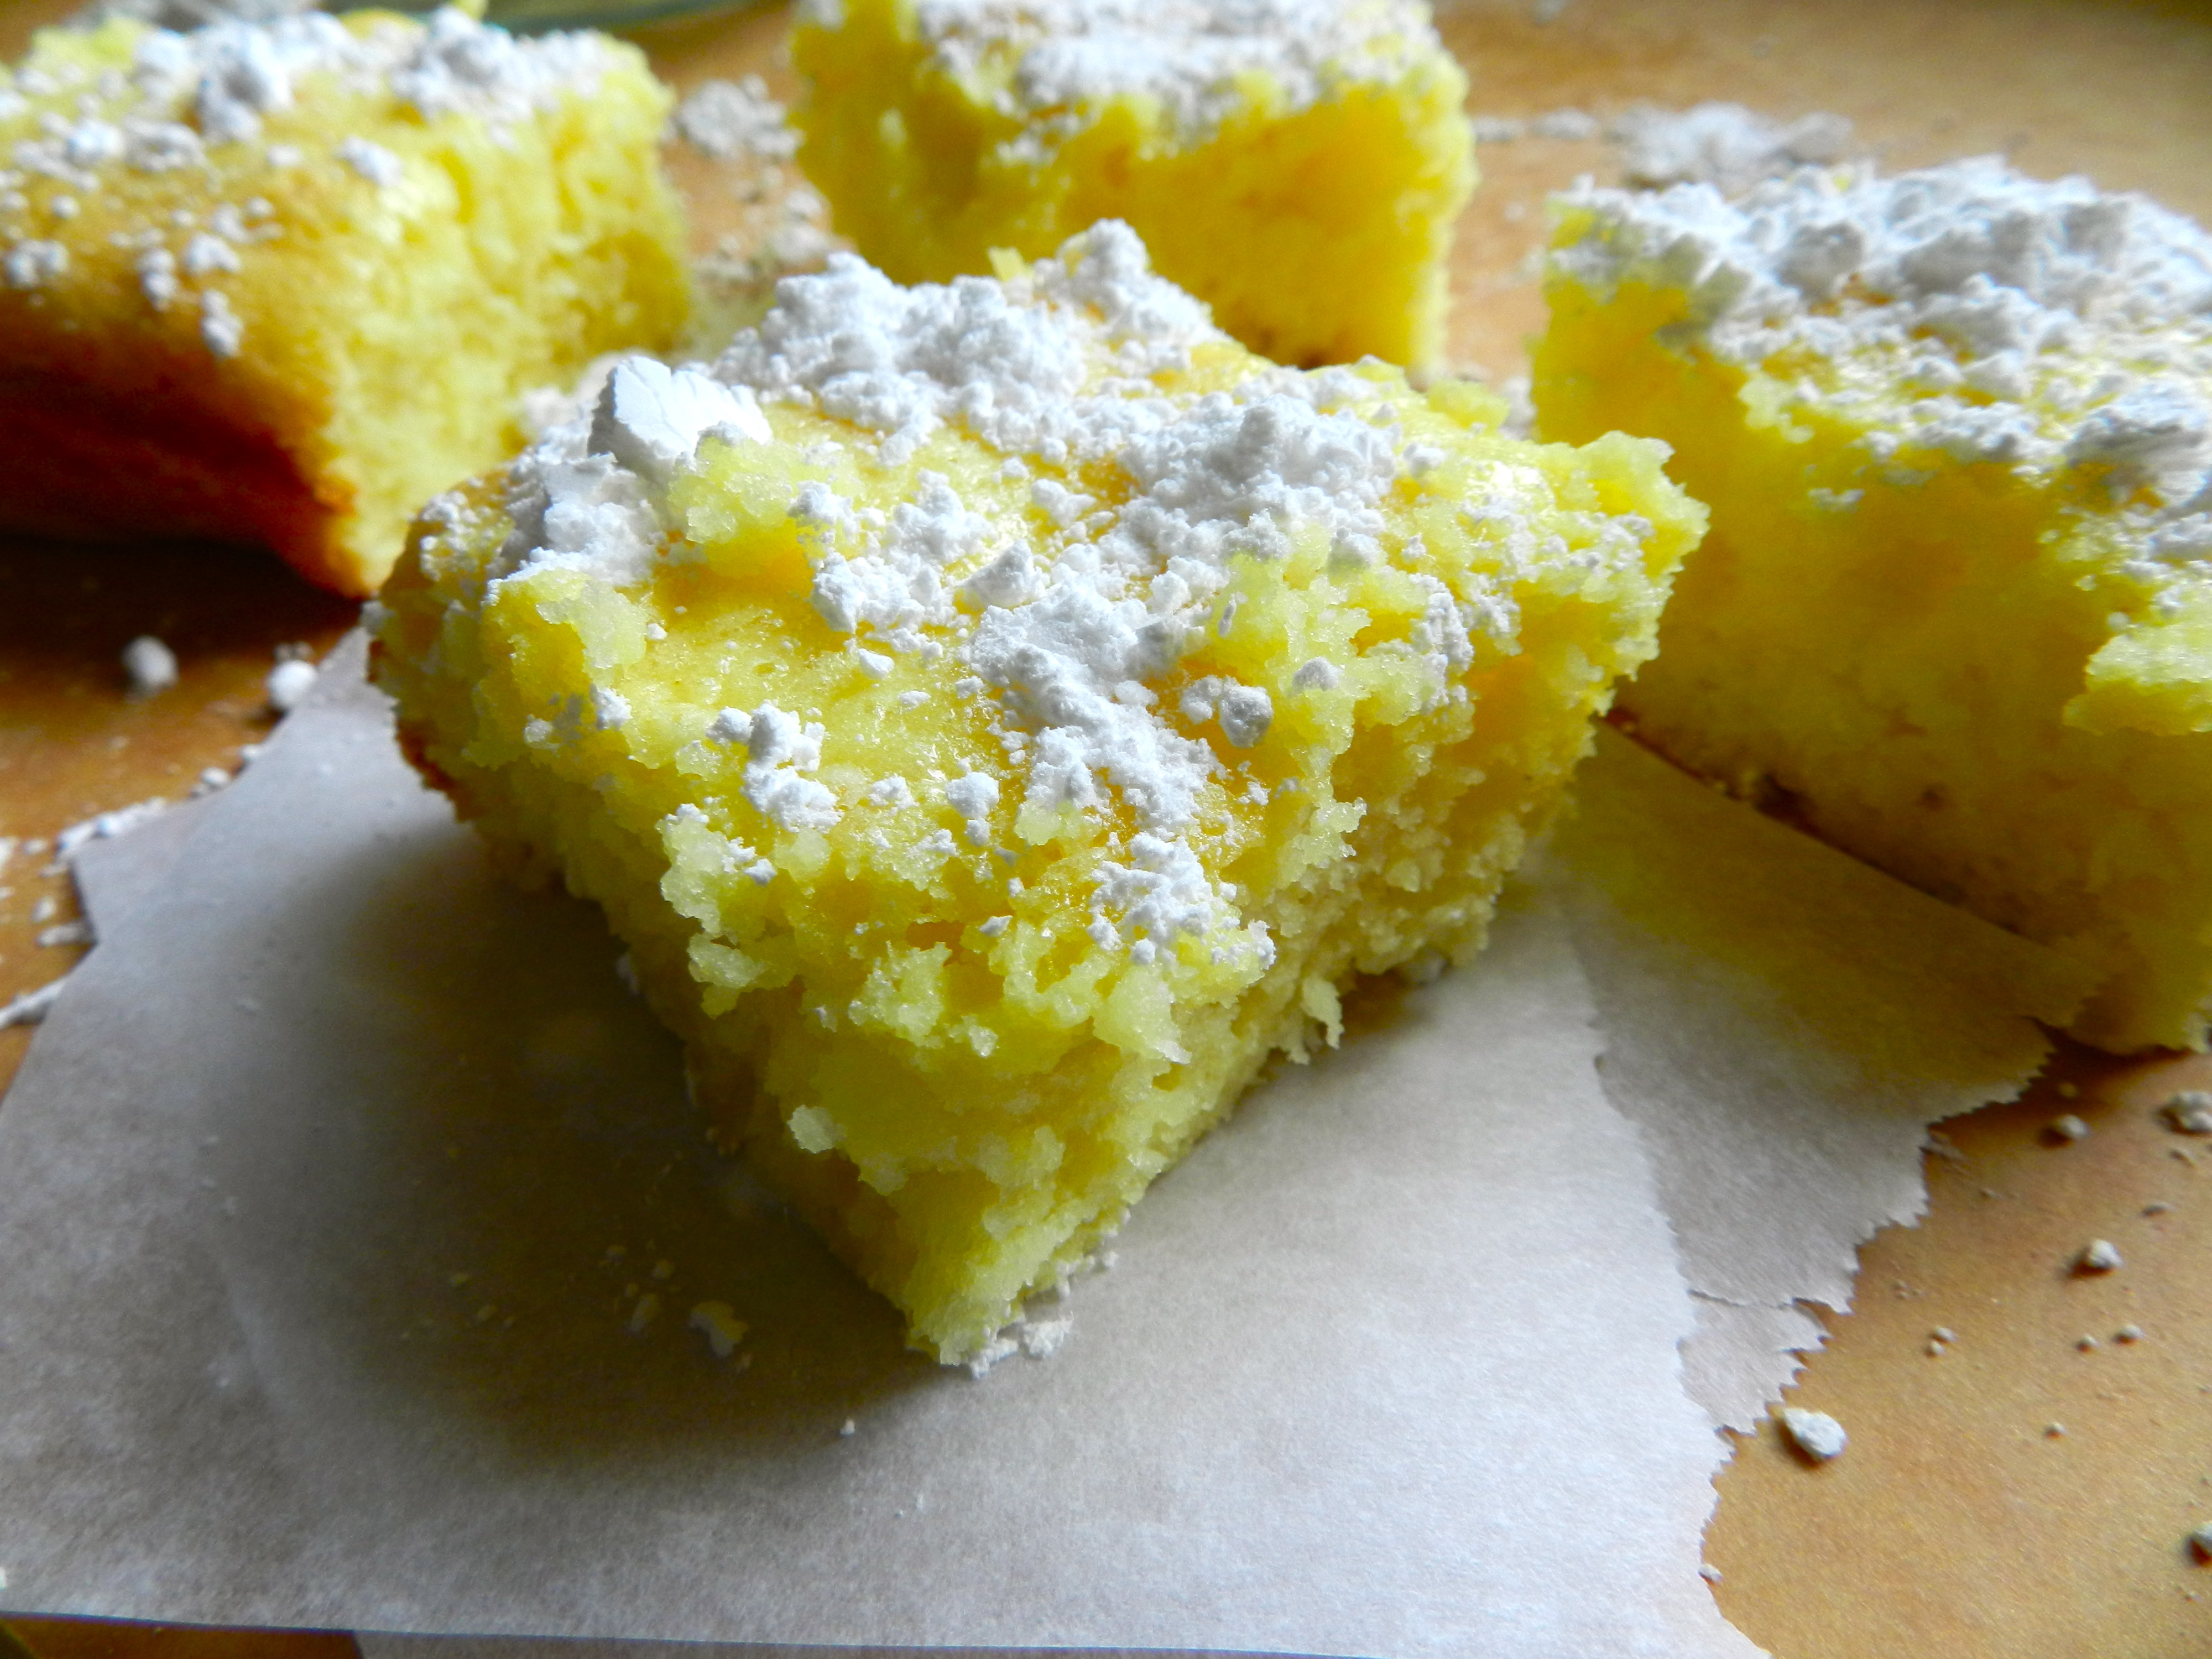 Lemon Cake Recipes Using Box Mix: Two Ingredient Lemon Bars